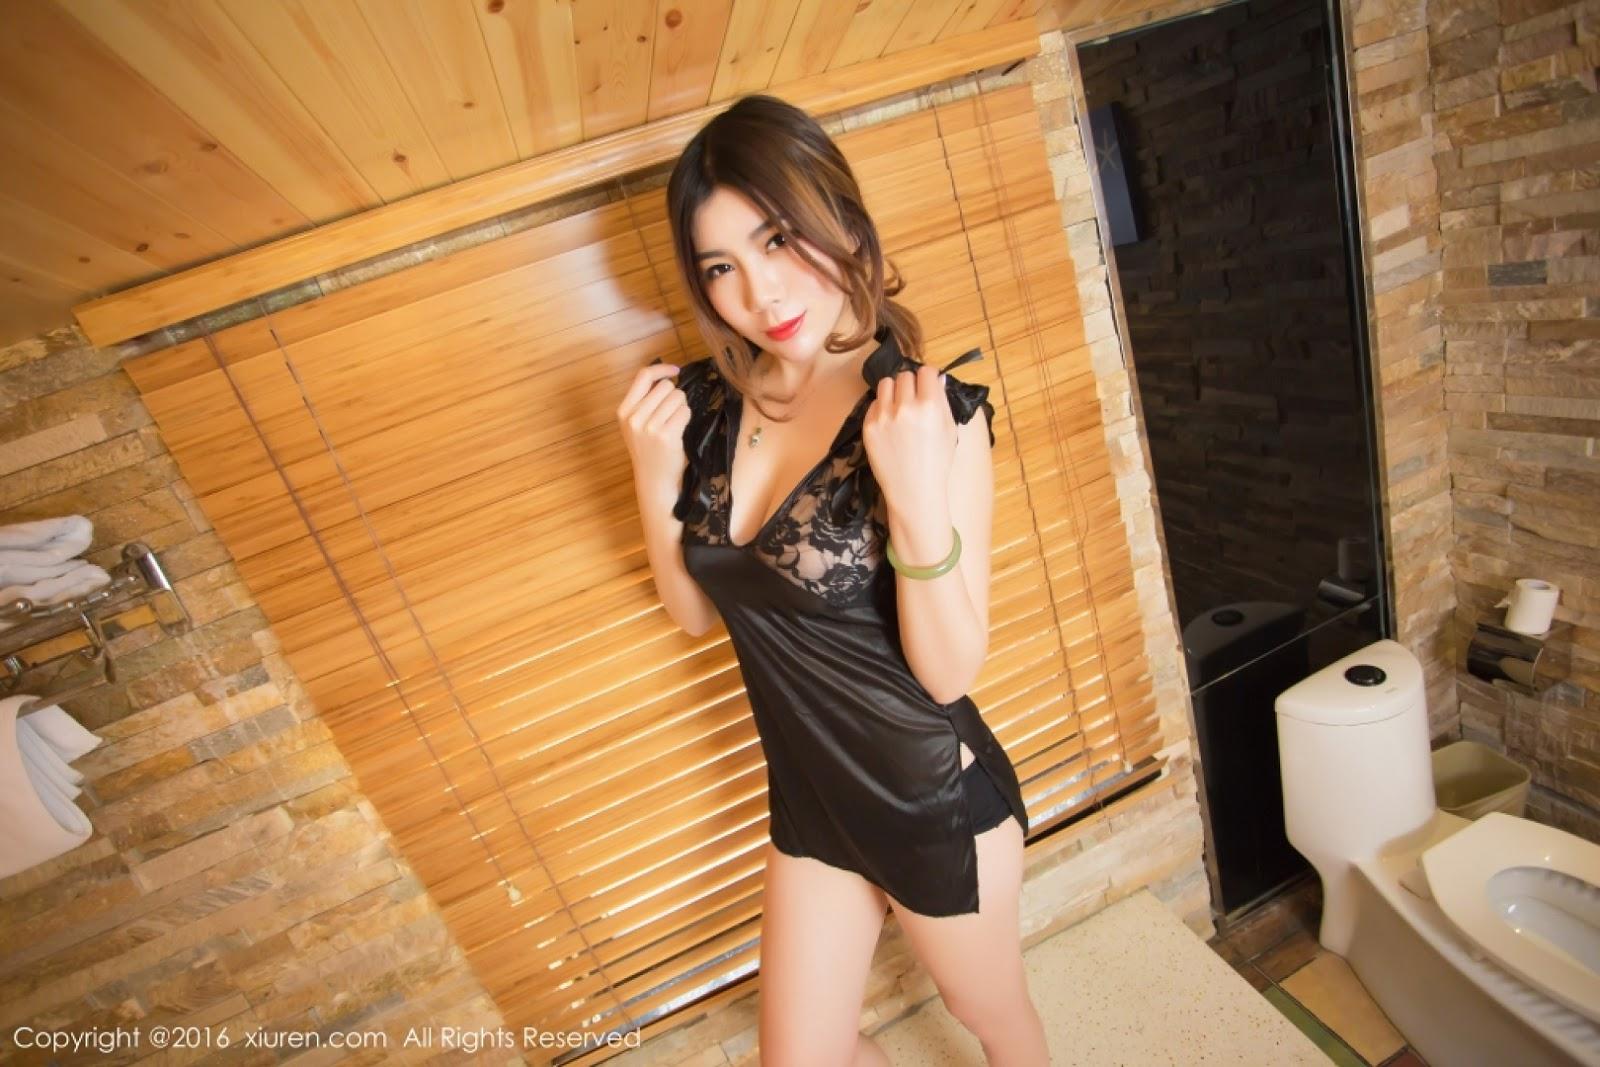 Goddess Mu Zi Xi (Bing Bing) Superb Busty Chinese Nude With The Wet Kiss